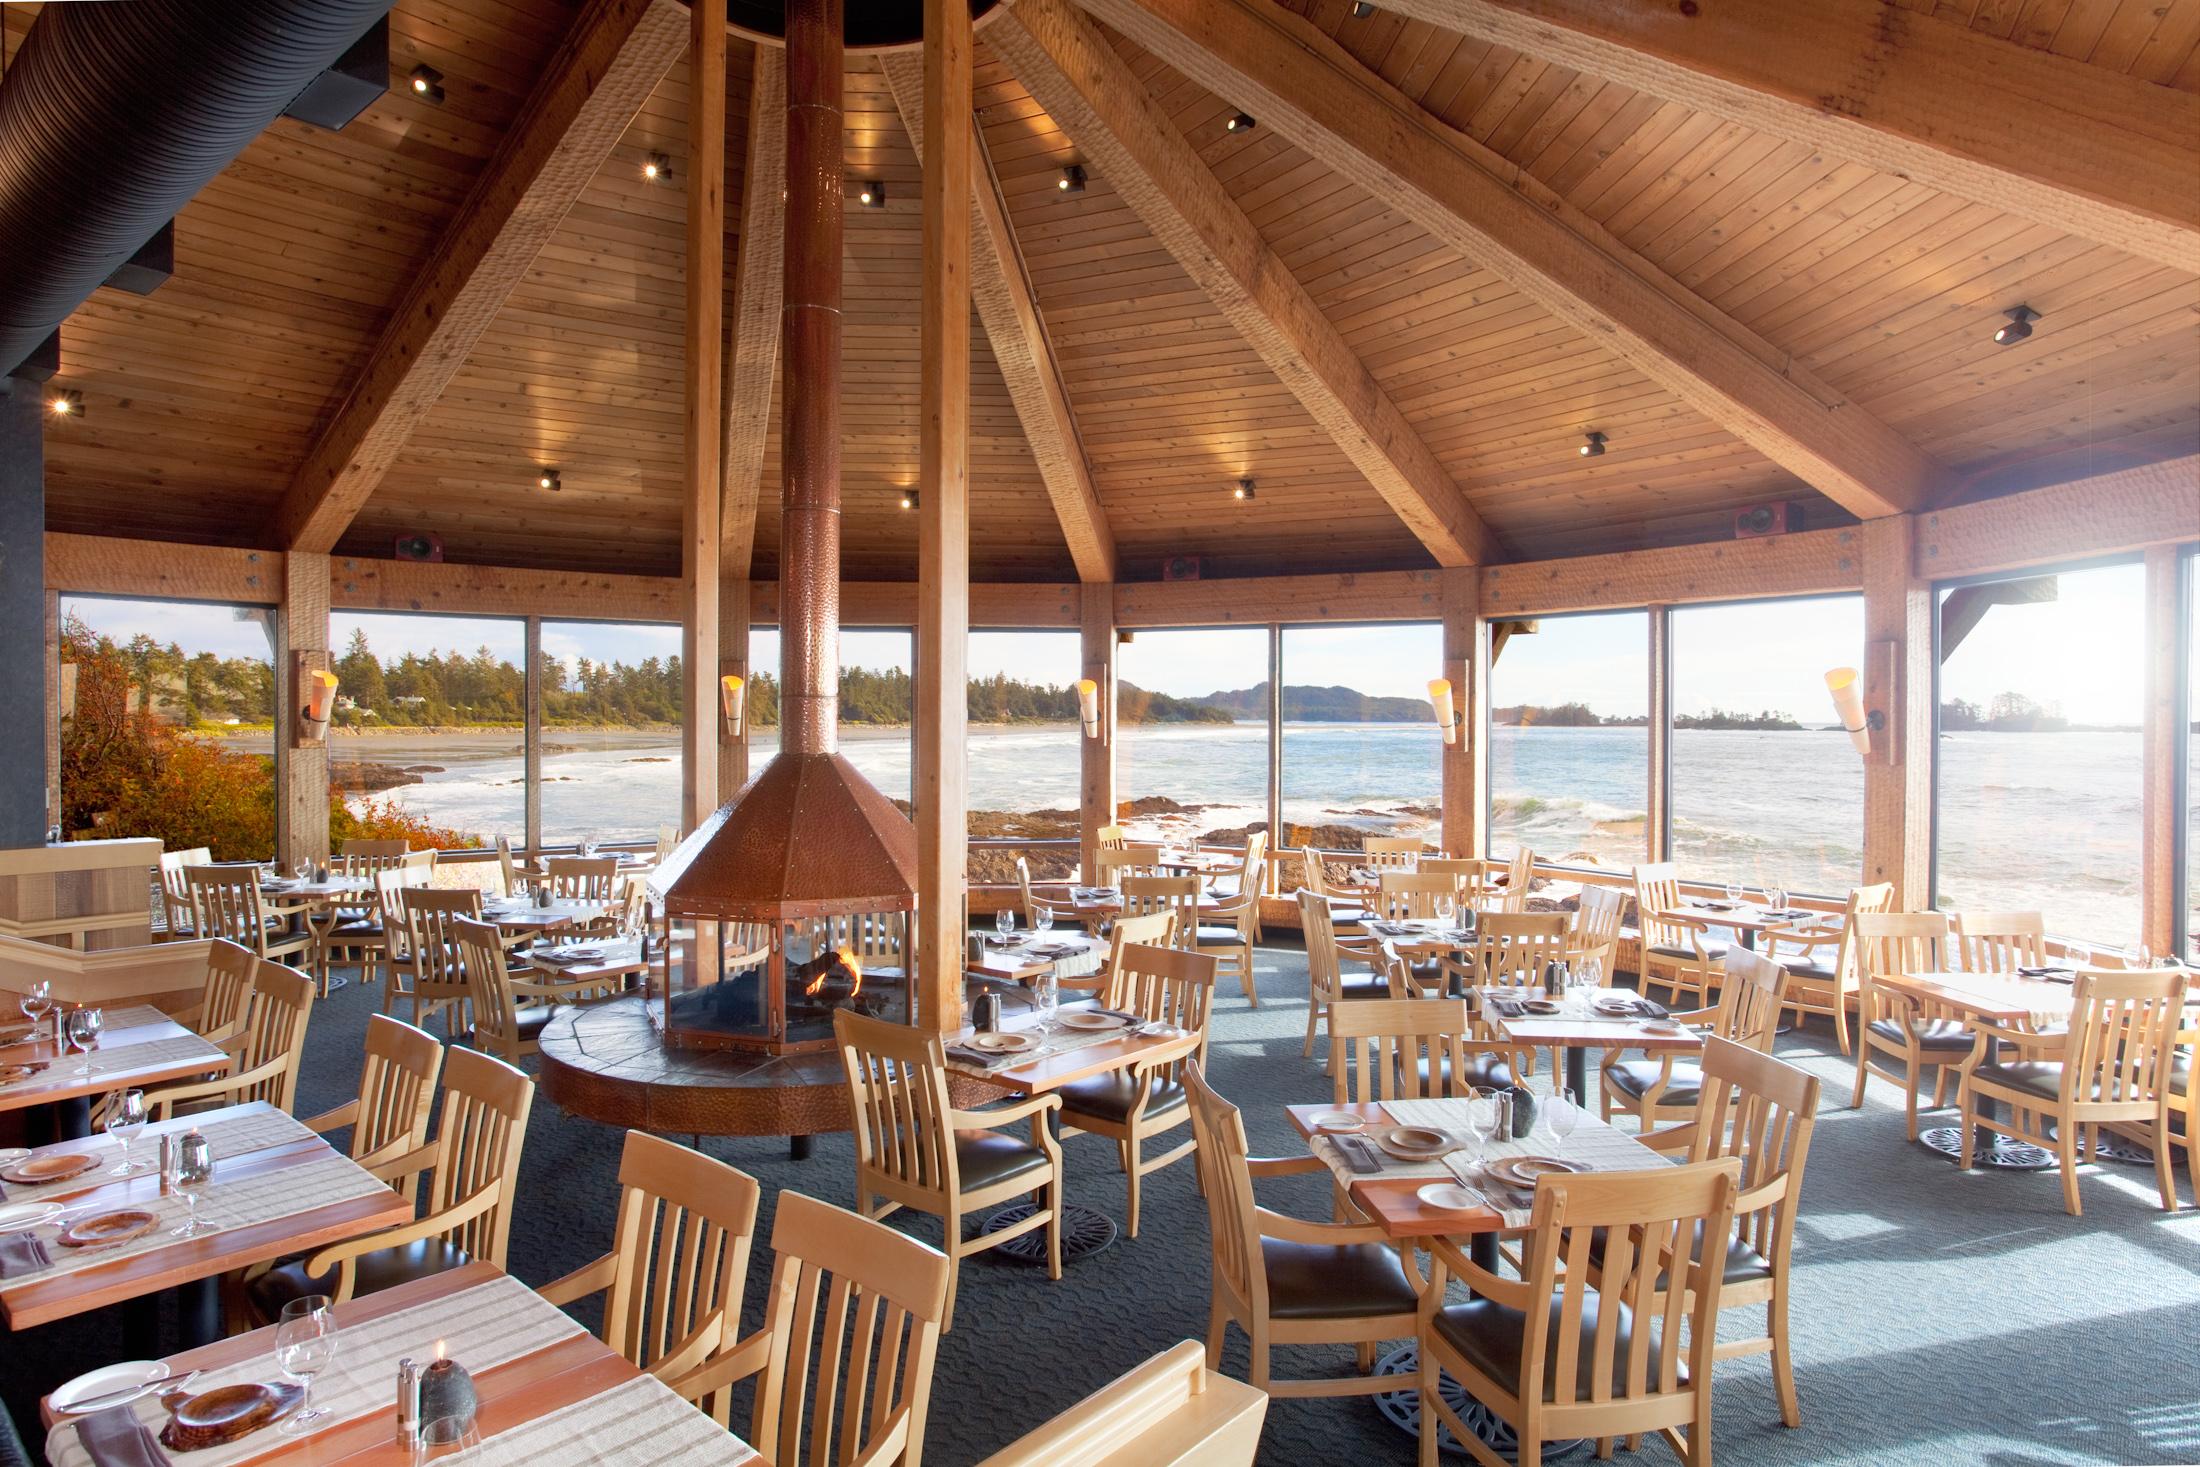 Wikaninnish Hotel in Tofino on Vancouver Island